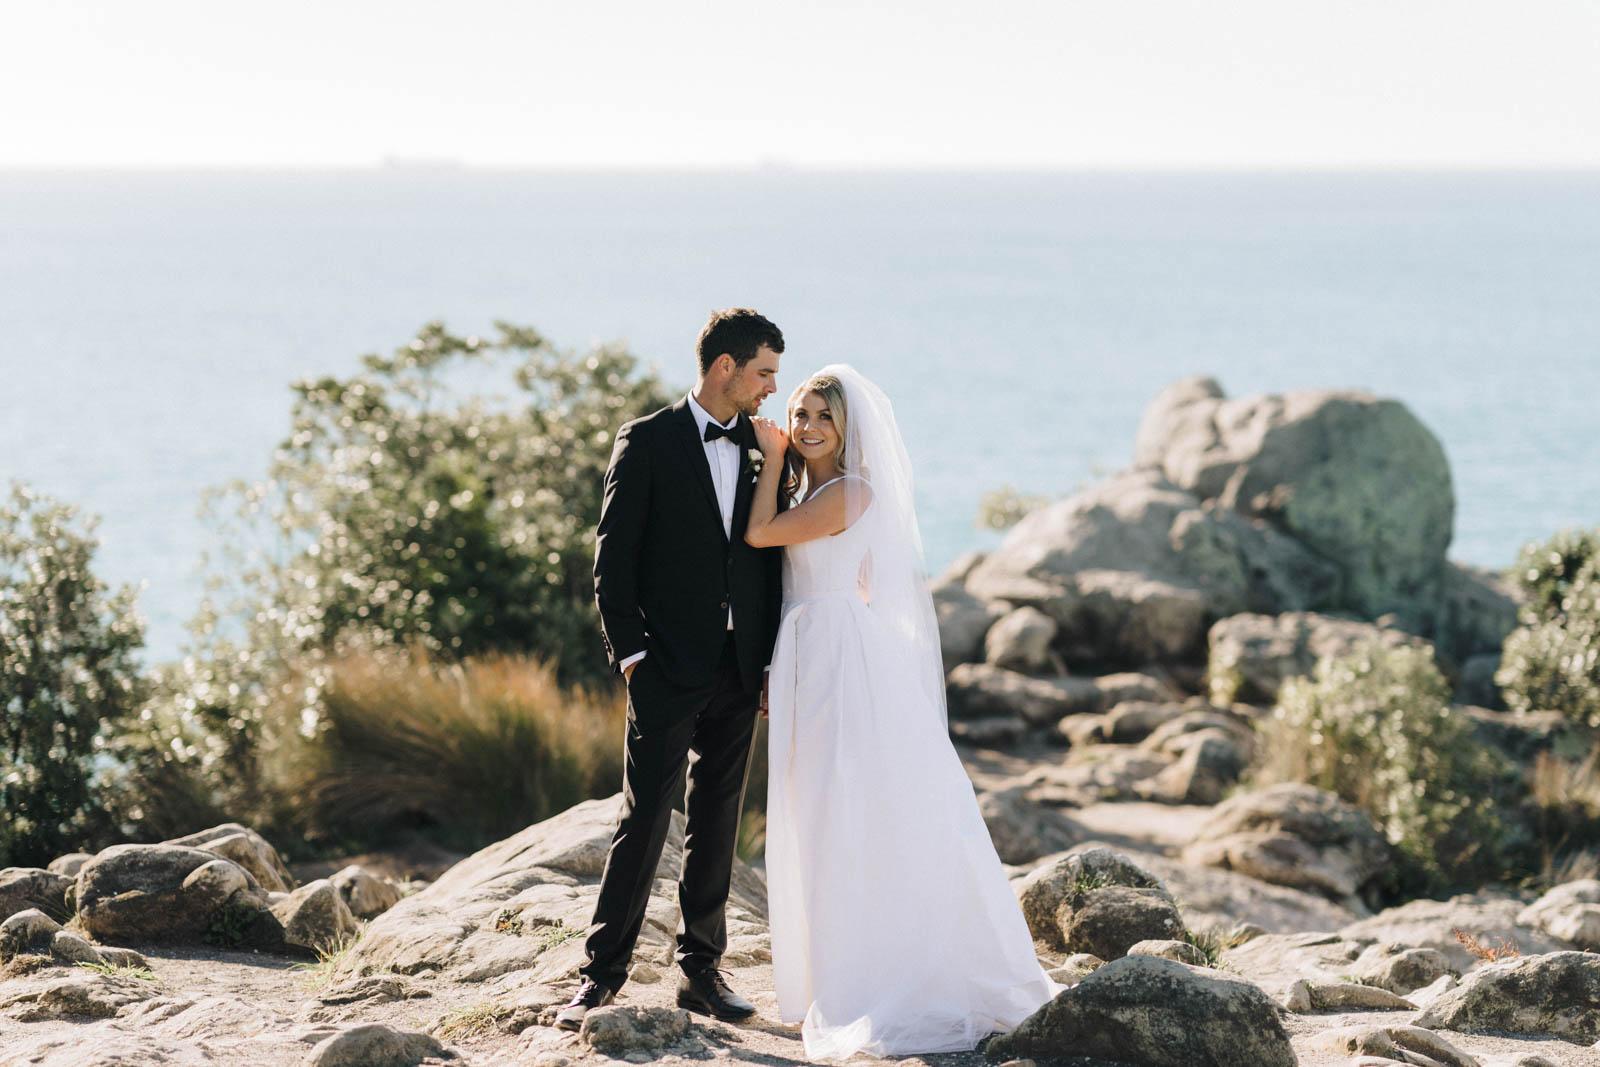 newfound-s-p-mt-maunganui-tauranga-wedding-photographer-1555-A9_05600